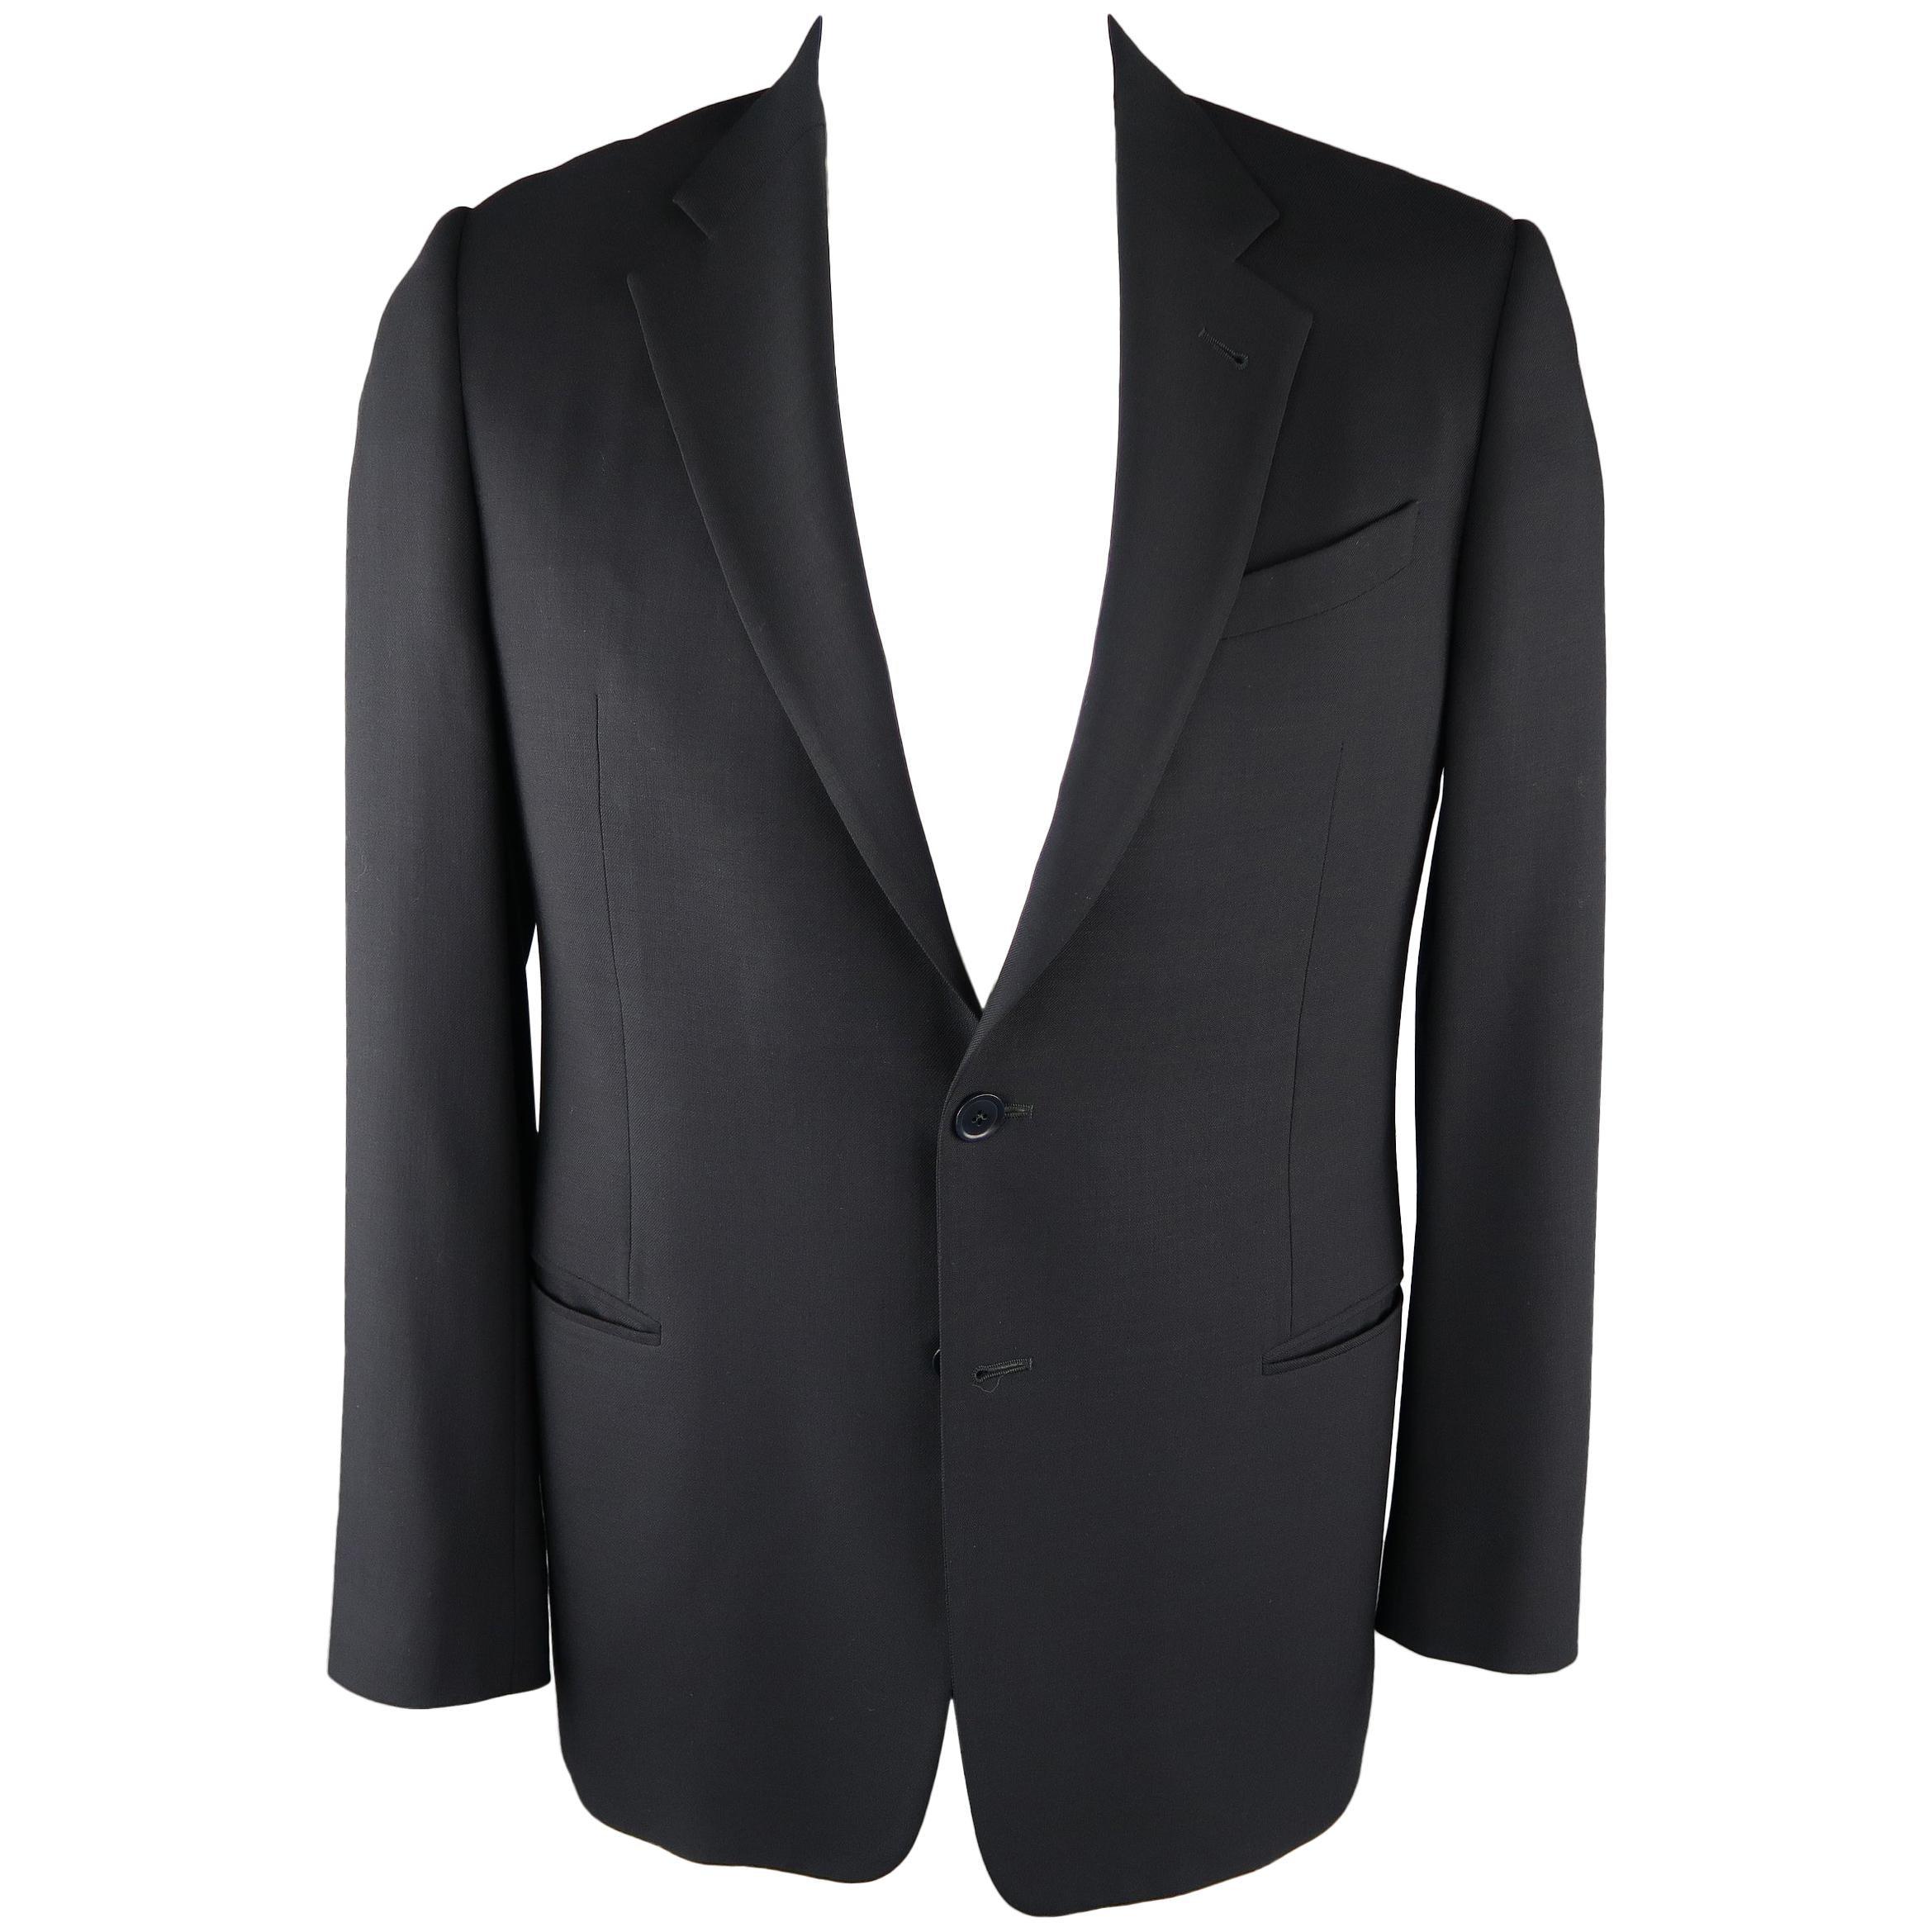 ARMANI COLLEZIONI 42 Regular Navy Solid Wool Blazer / Sport Coat